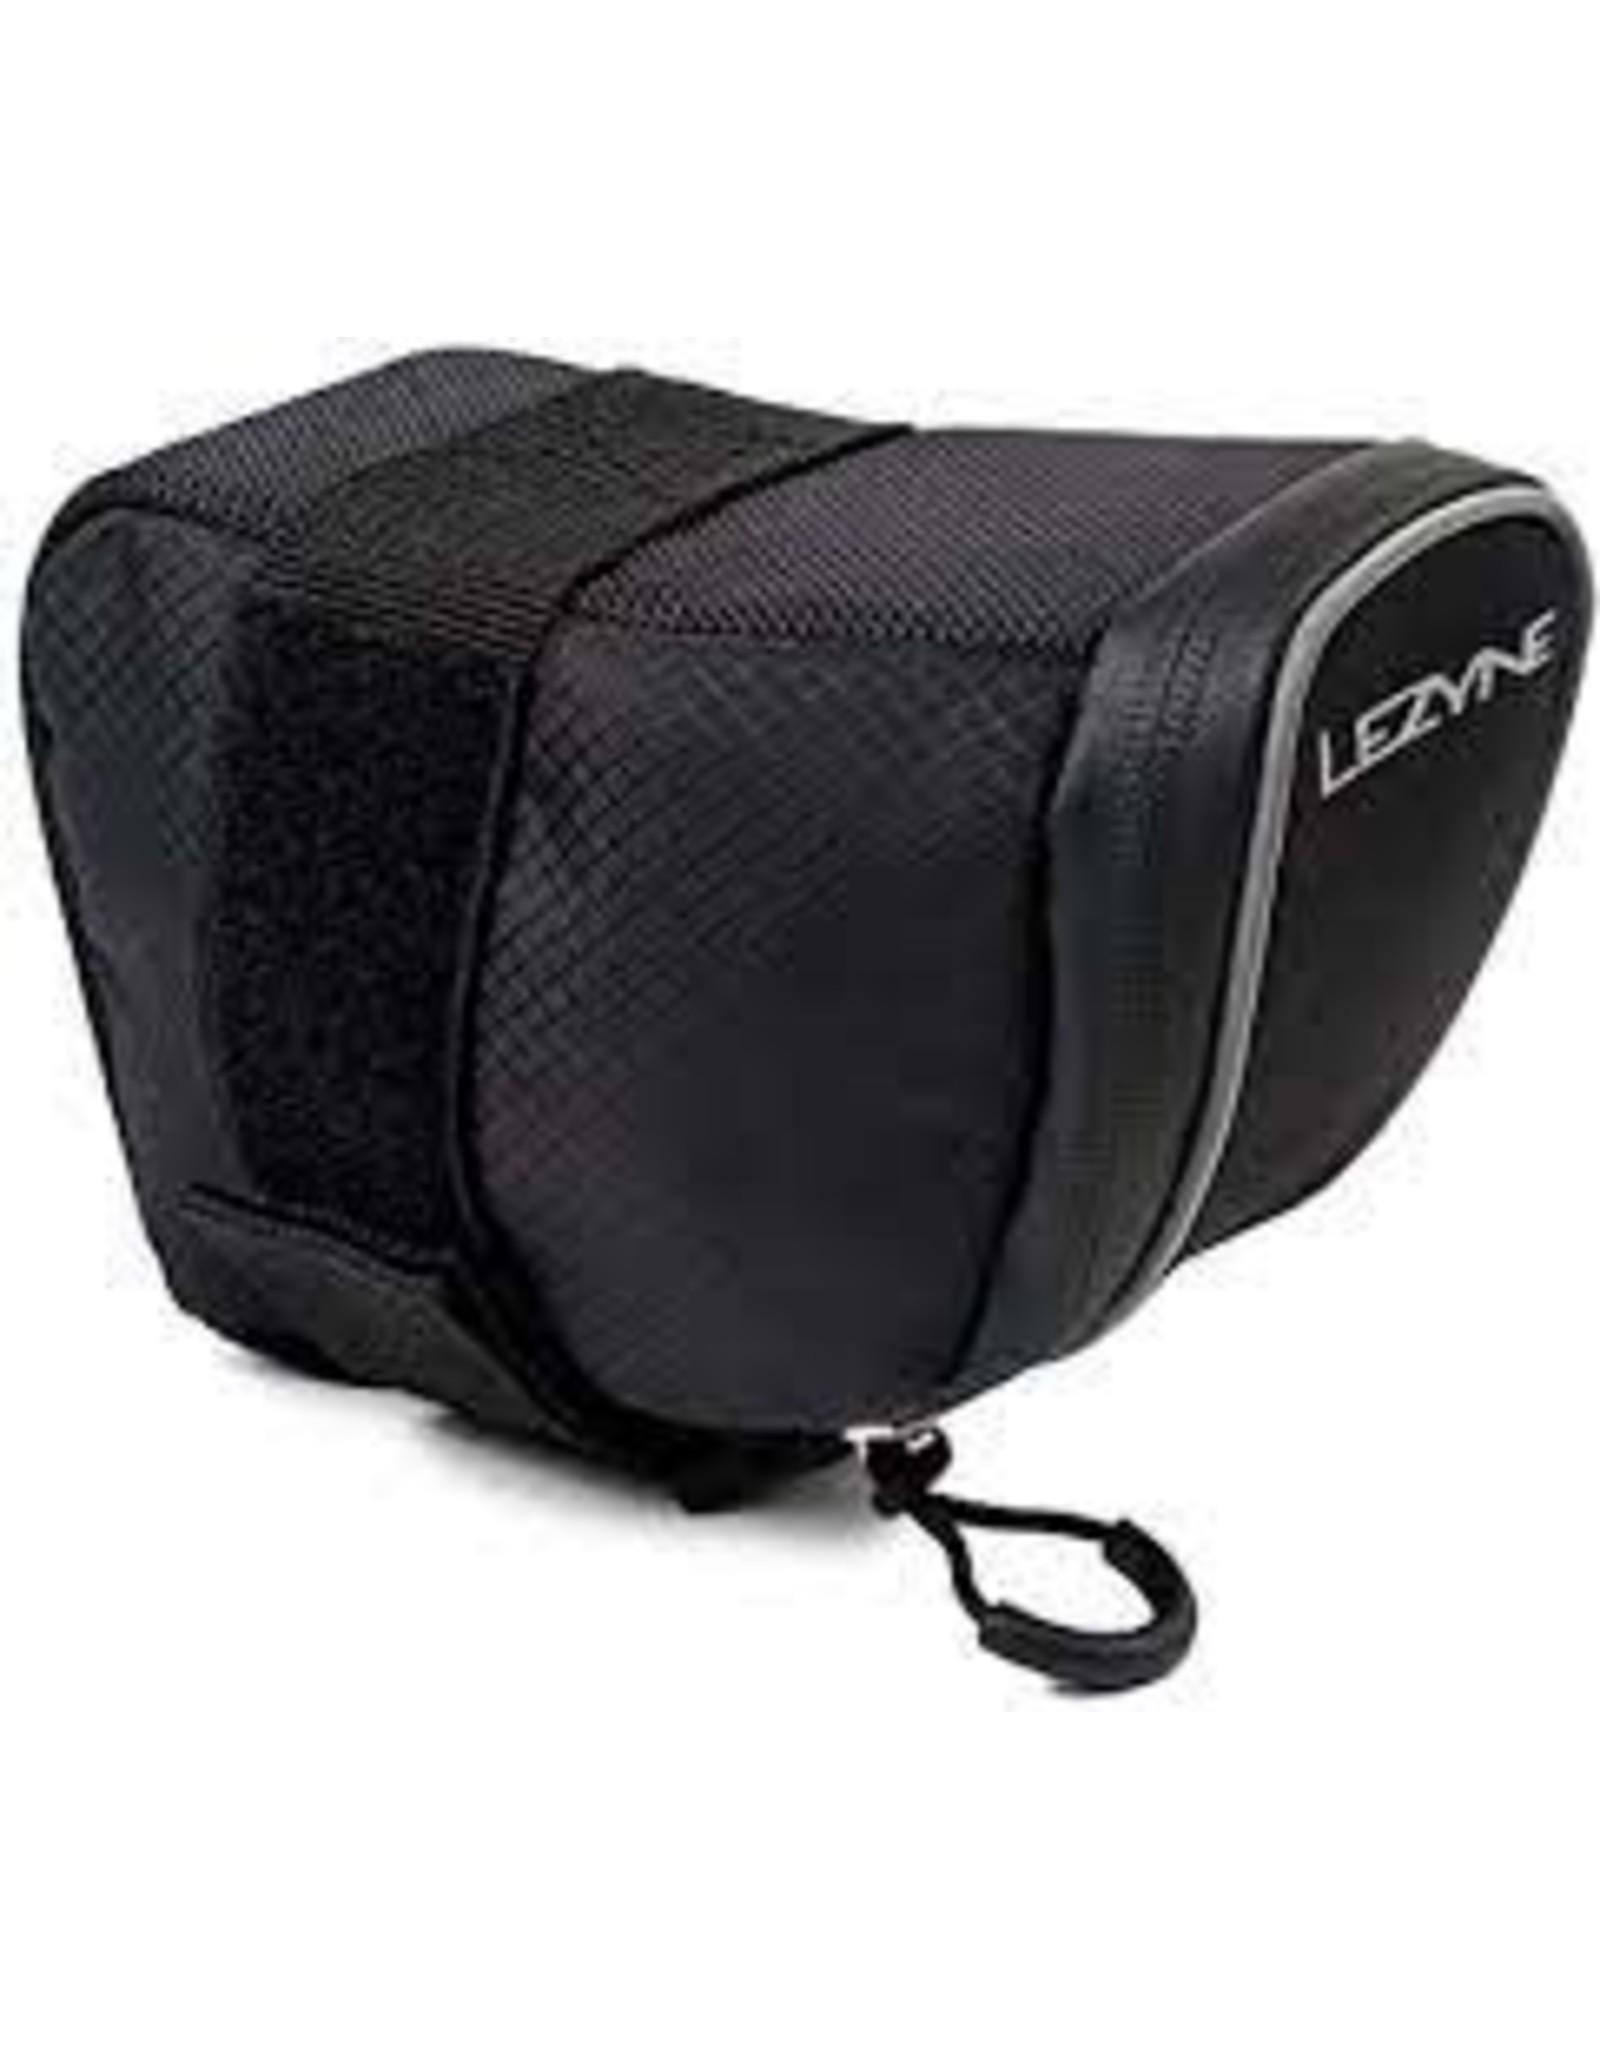 Lezyne Lezyne Micro Caddy-S Road Seat Bag: Black